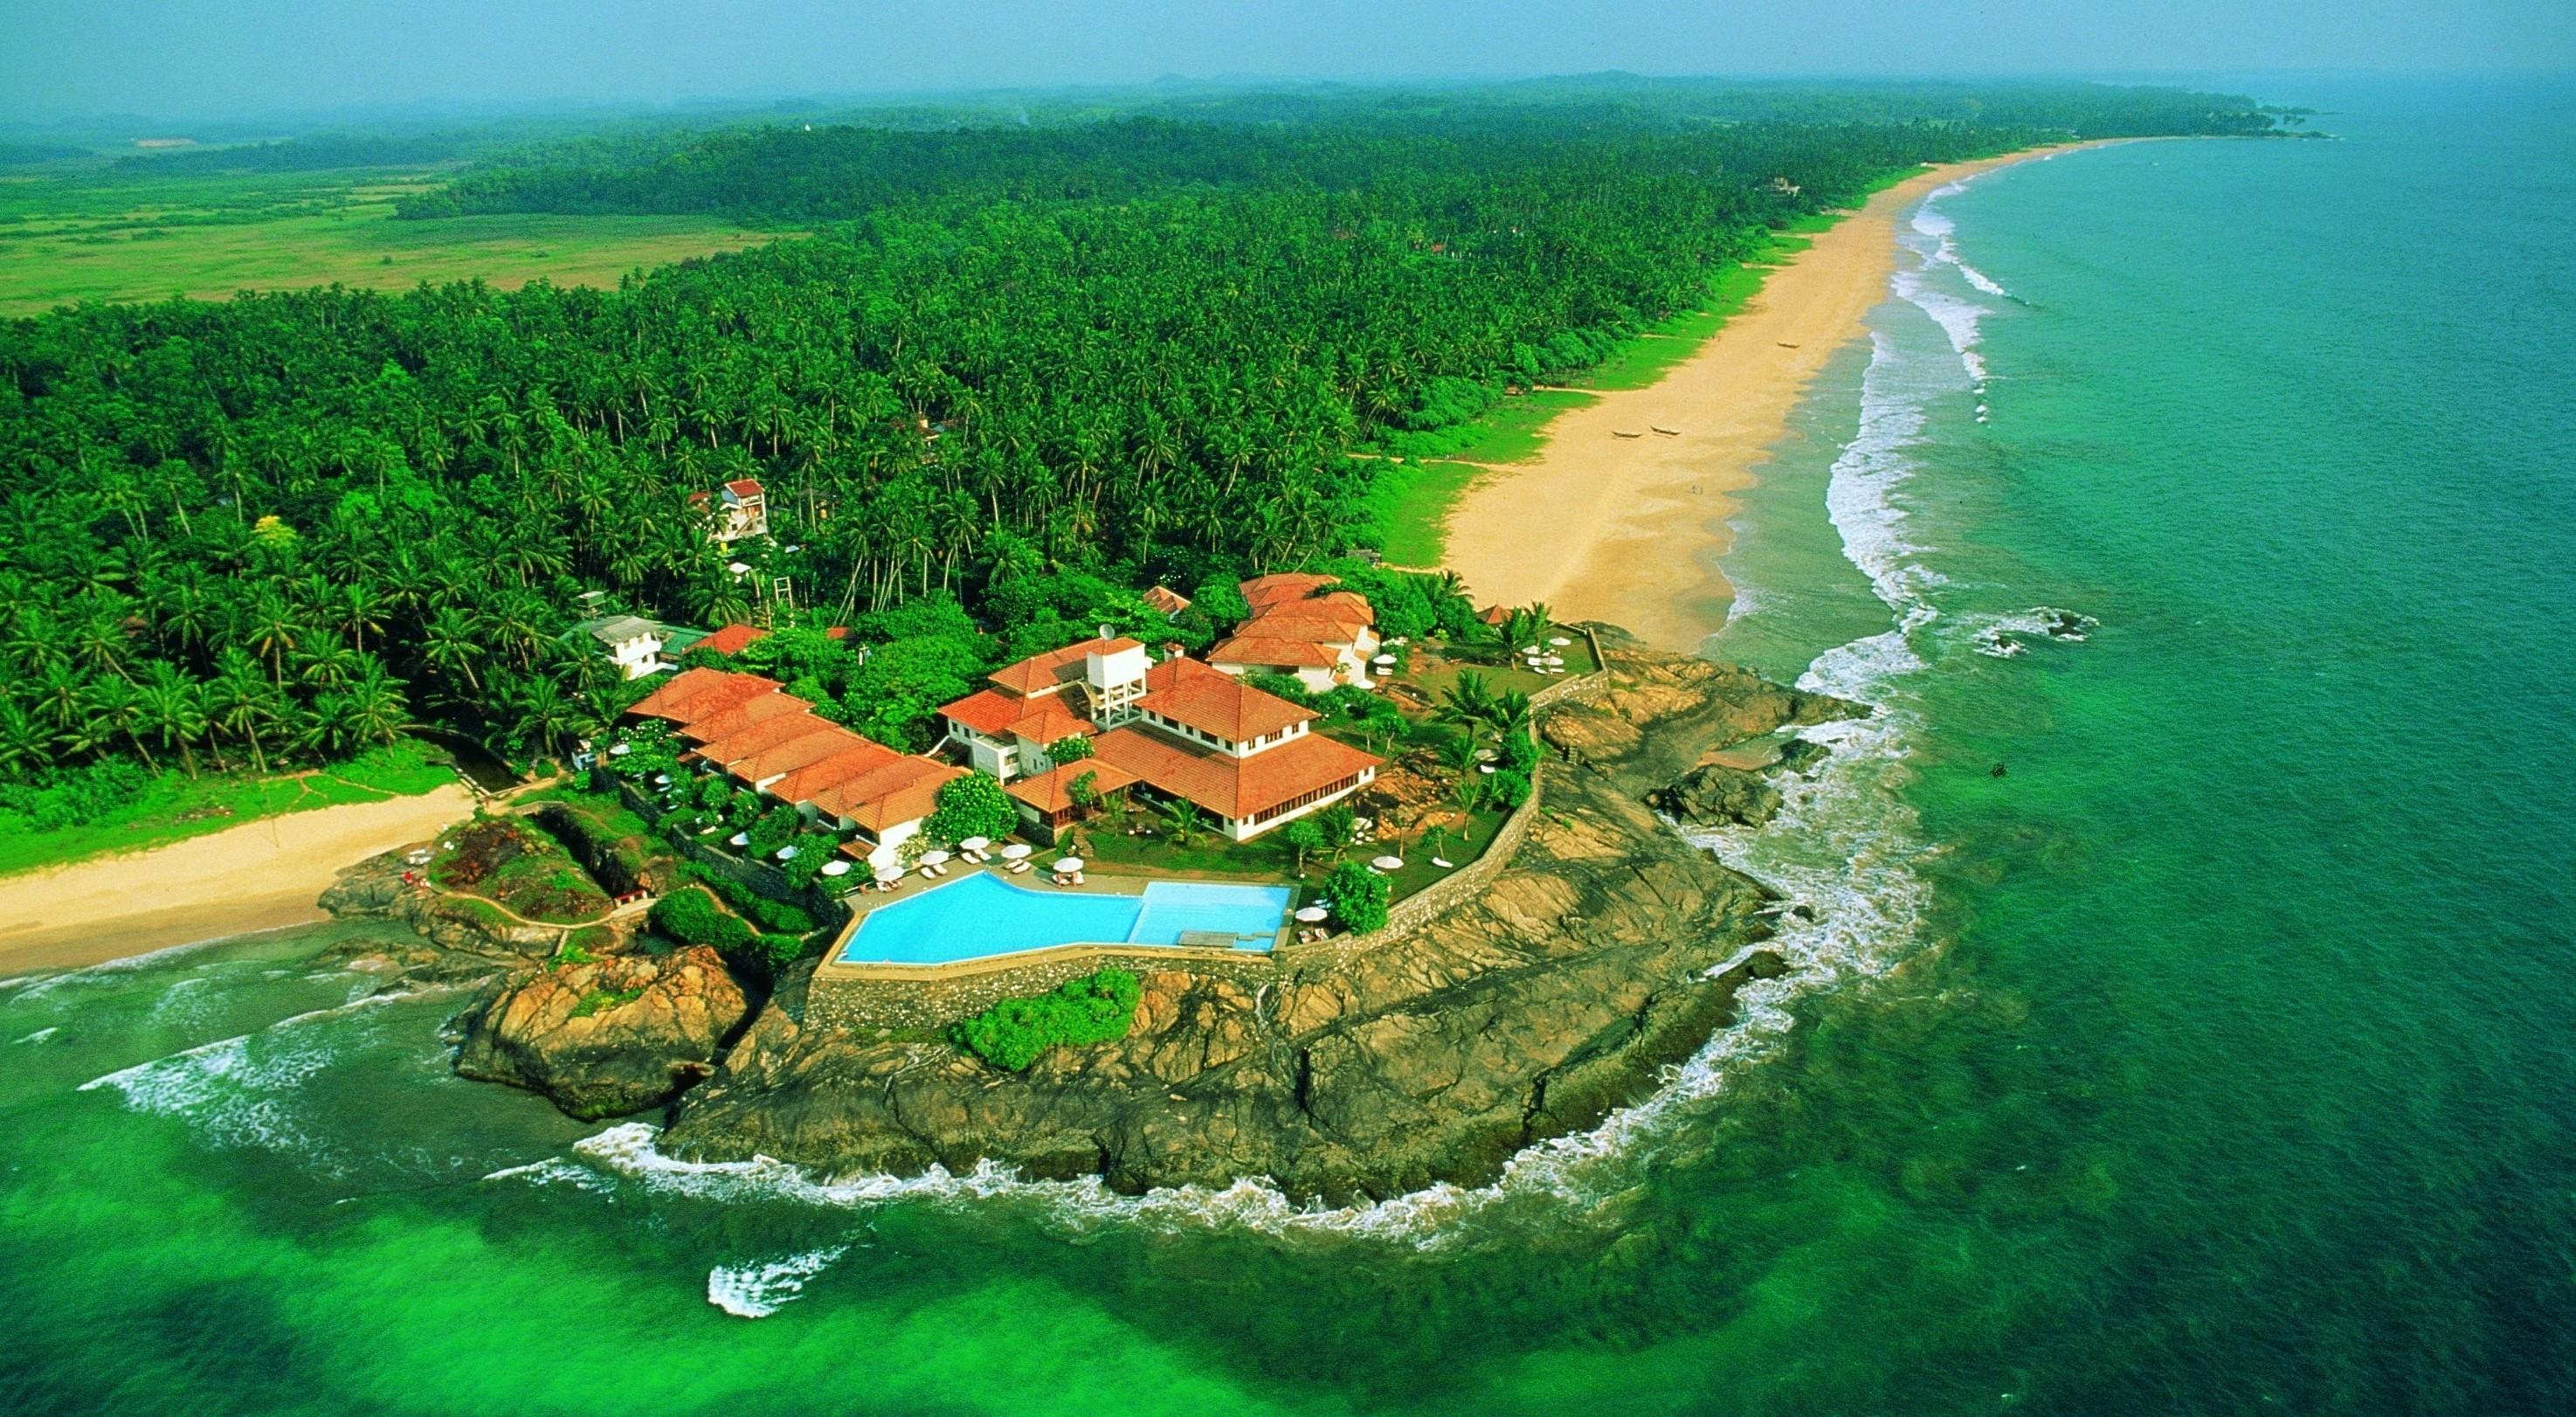 Bentota is a coastal town in Sri Lanka